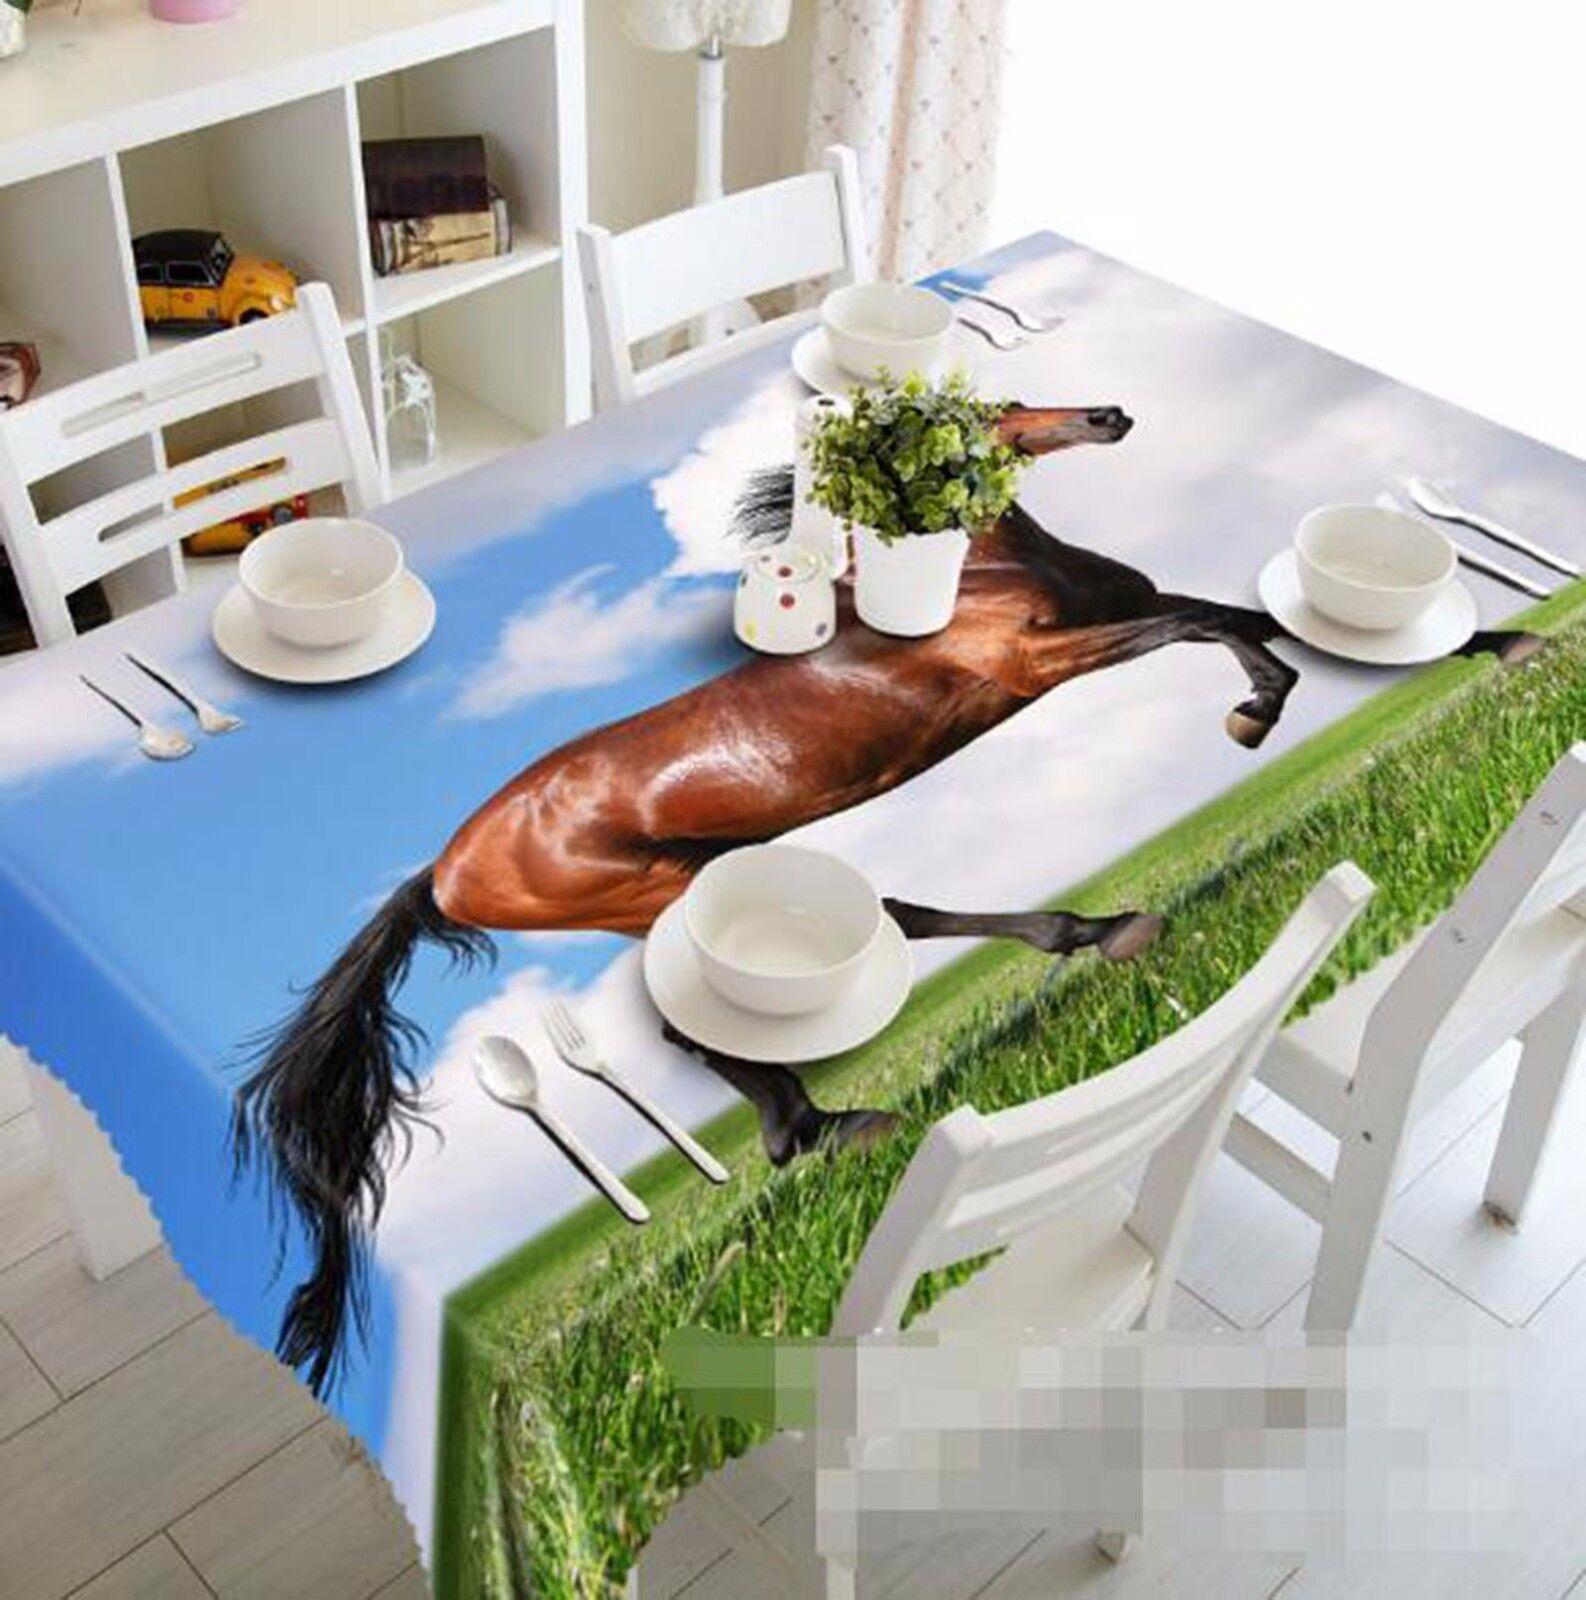 3D Horse 406 406 406 Tablecloth Table Cover Cloth Birthday Party AJ WALLPAPER UK Lemon d13263